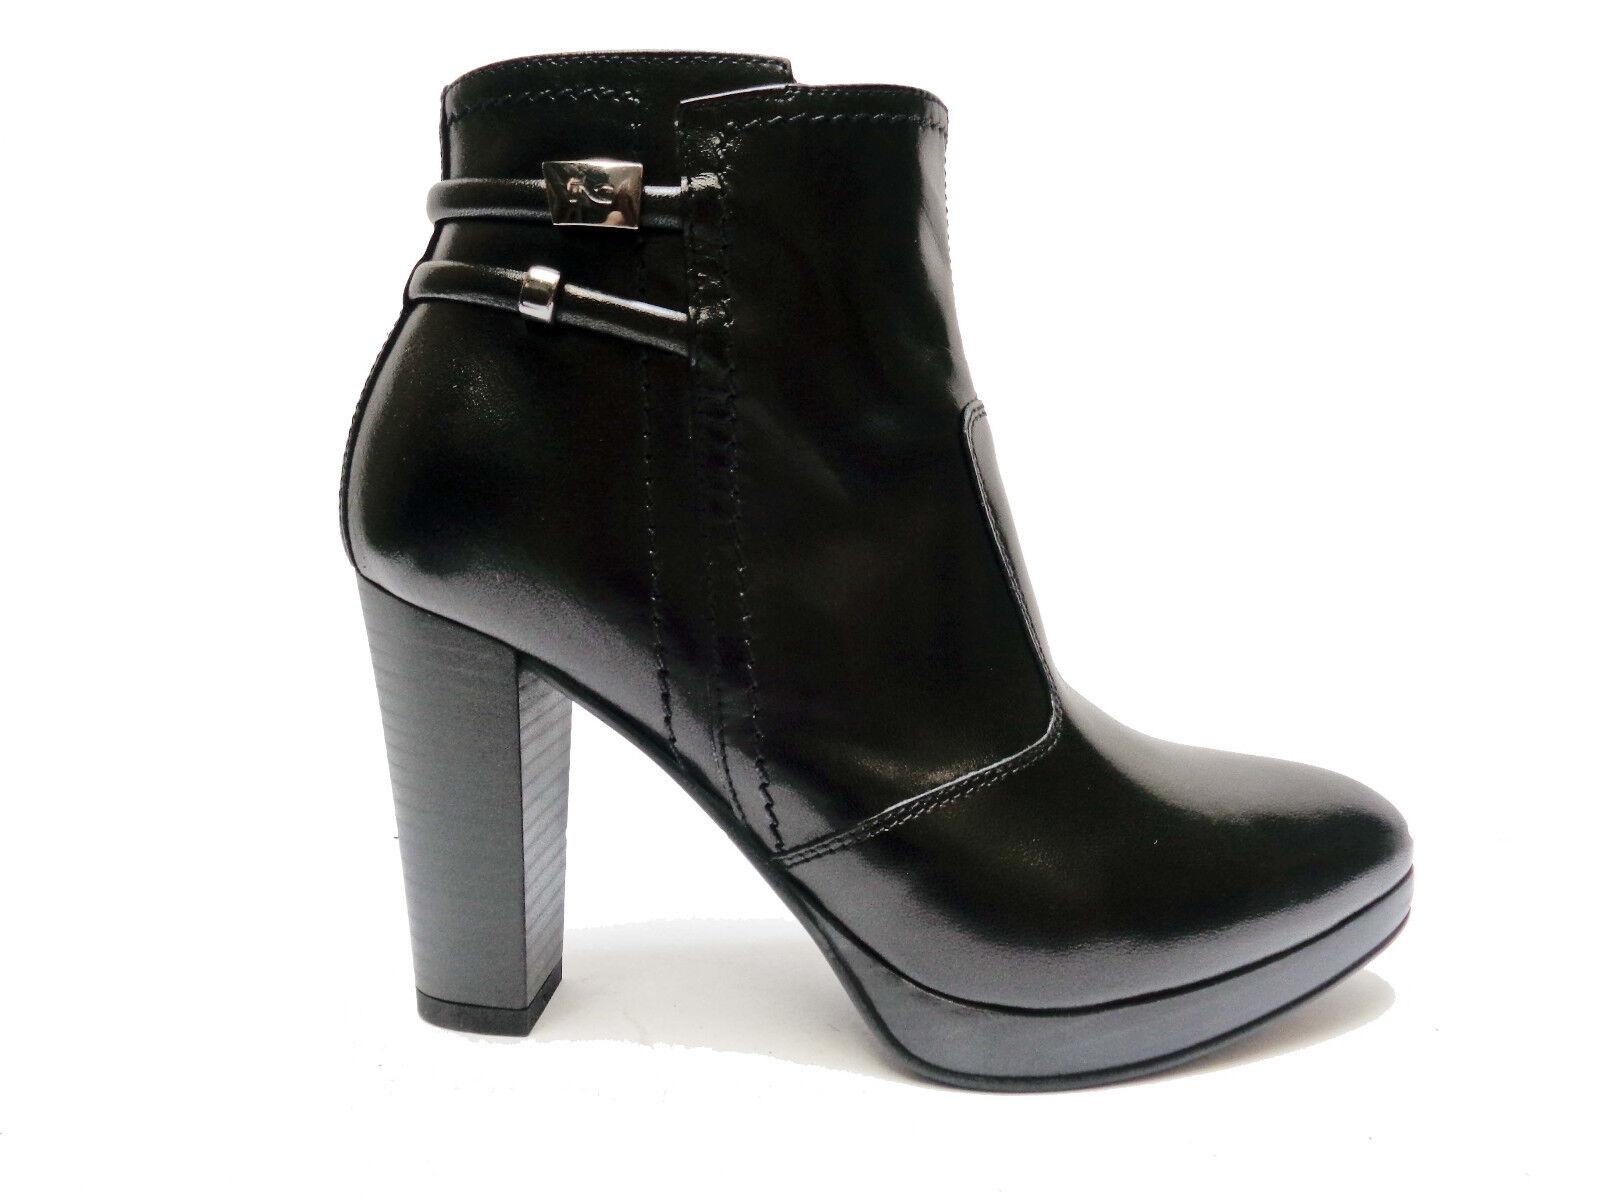 shoes women black GIARDINI 6313 STIVALETTI IN PELLE black TACCO CM. 9